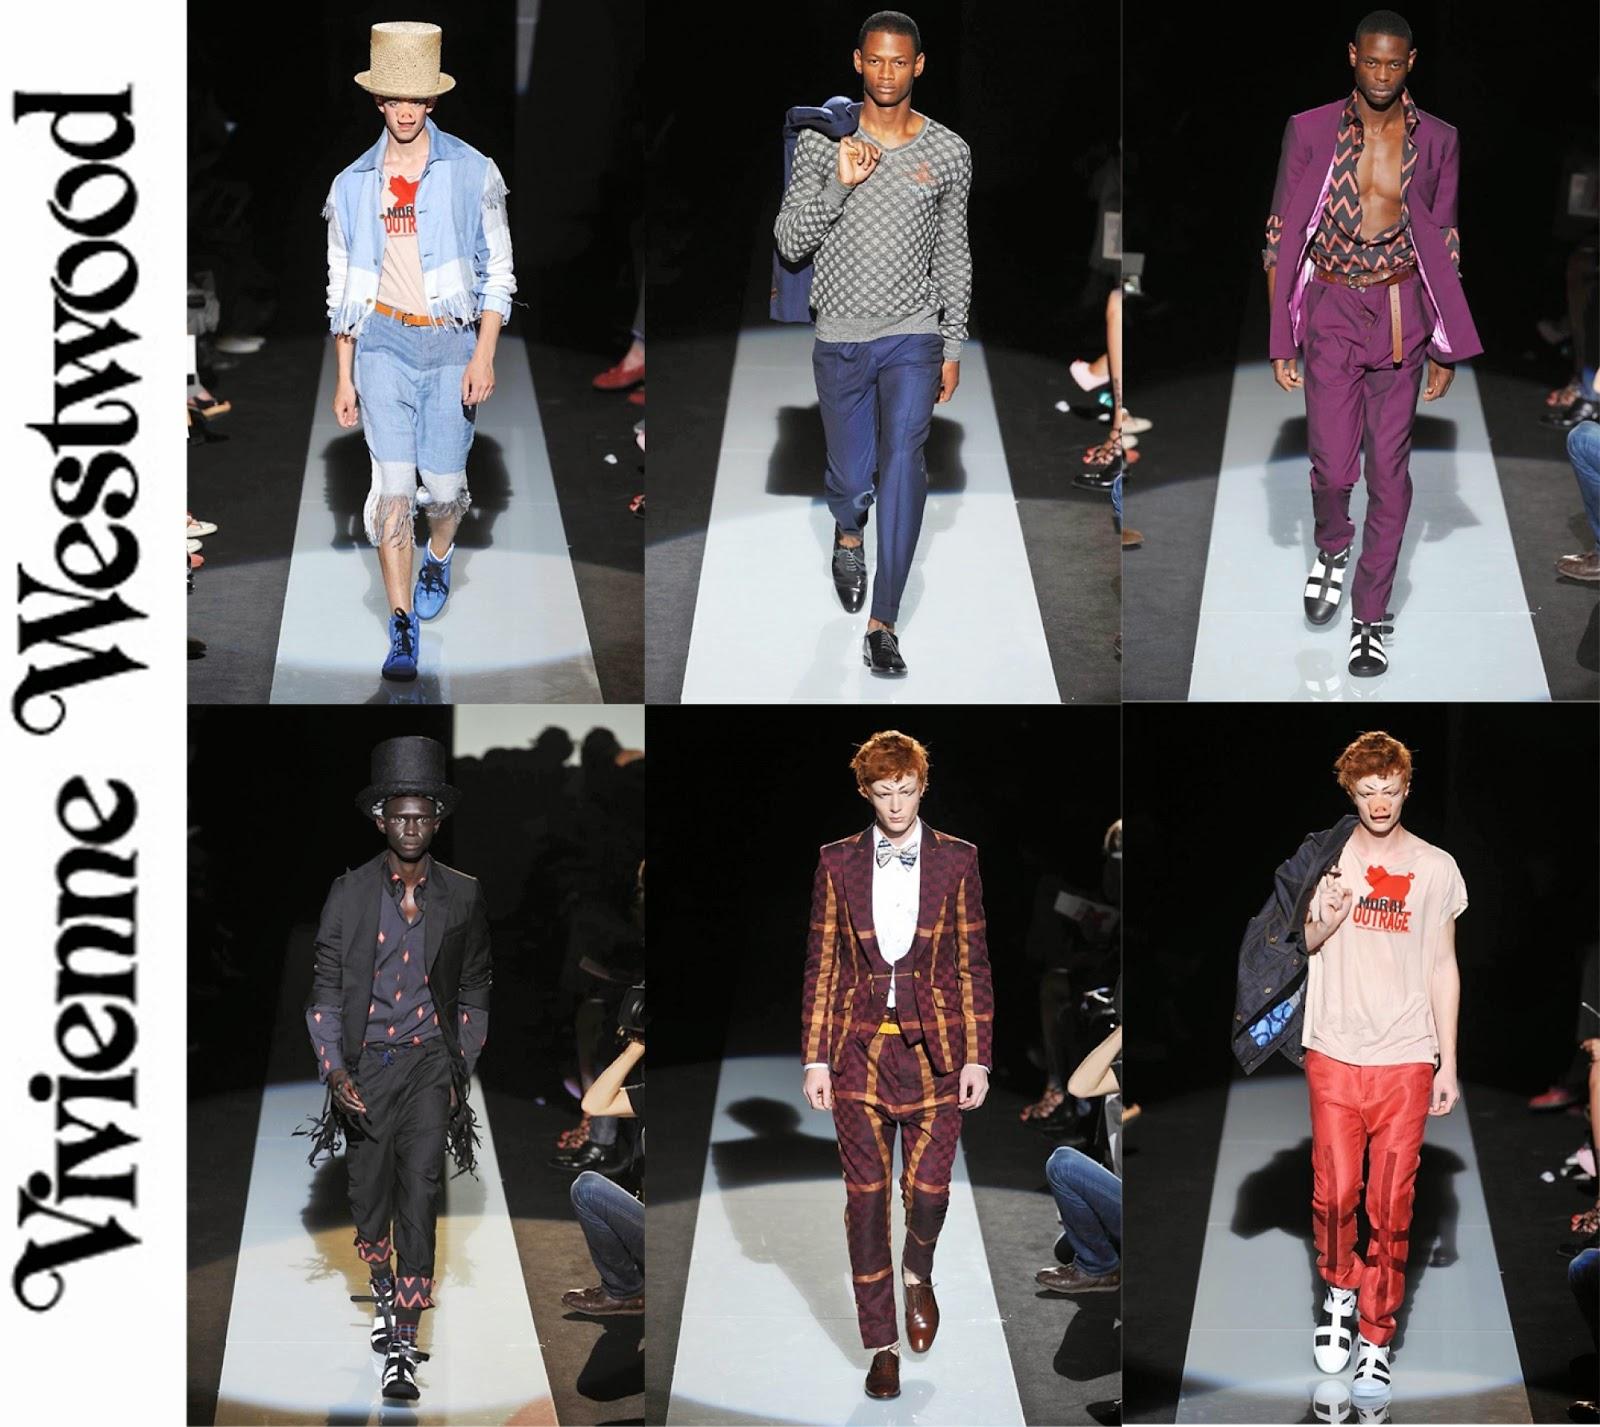 Eniwhere Fashion - Milano Moda Uomo - Primavera Estate 2015 - Vivienne Westwood